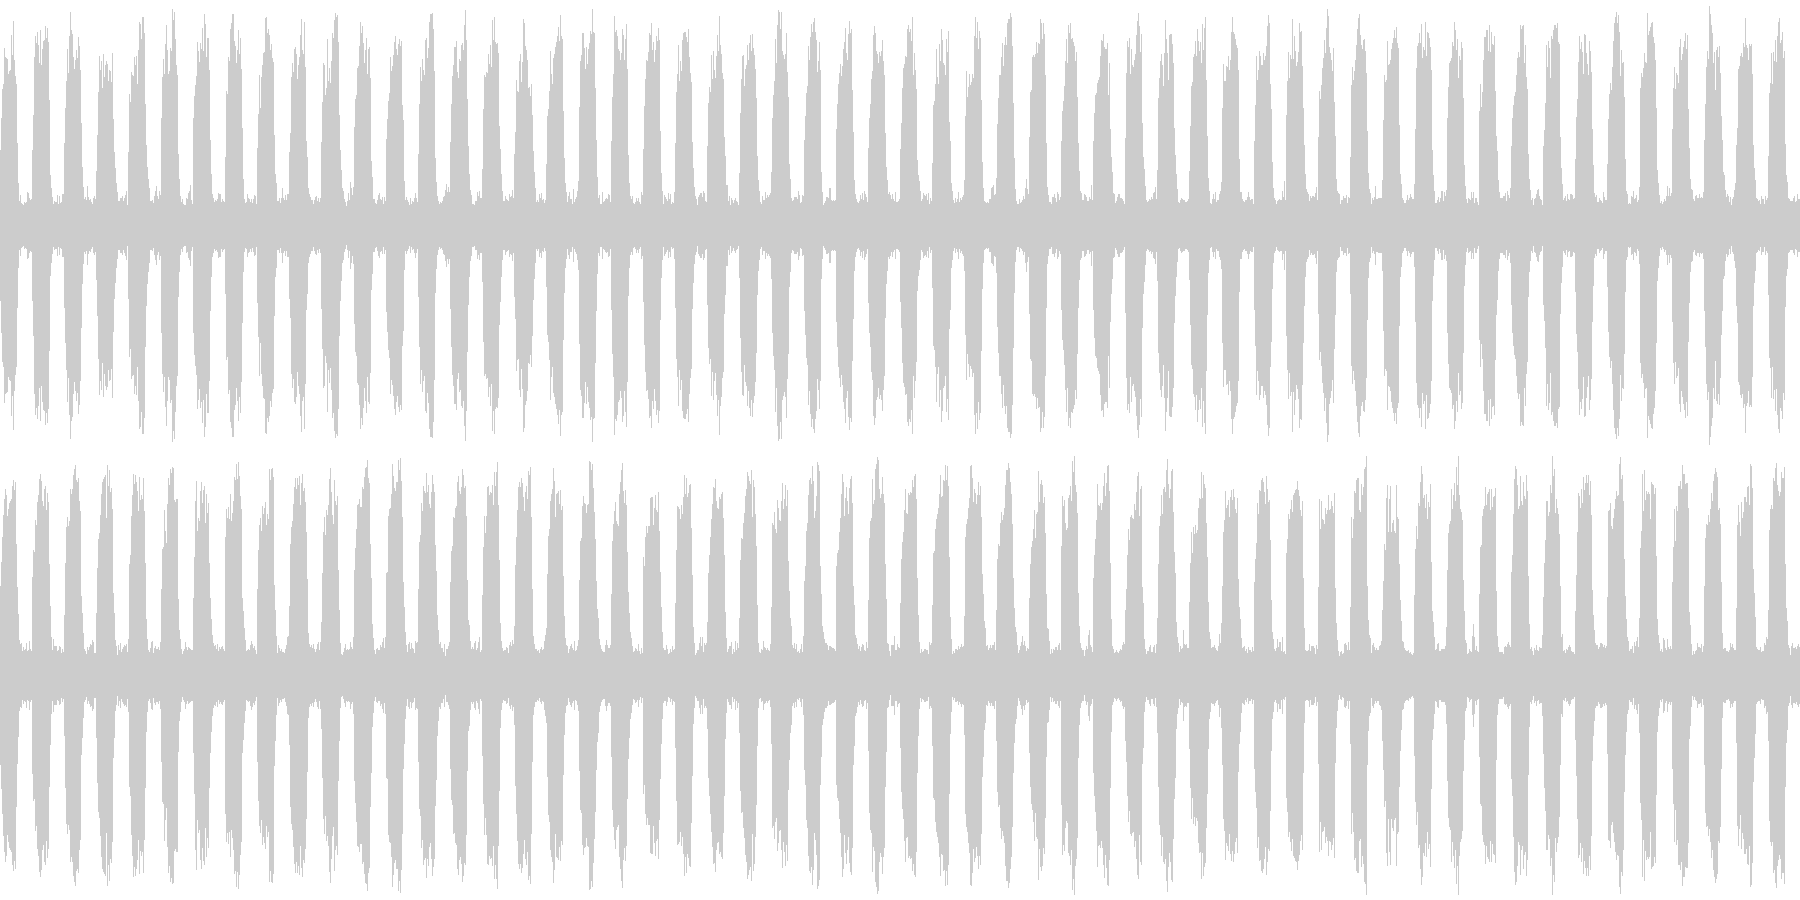 SF_緊急事態_警報_エマージェンシー1の未再生の波形